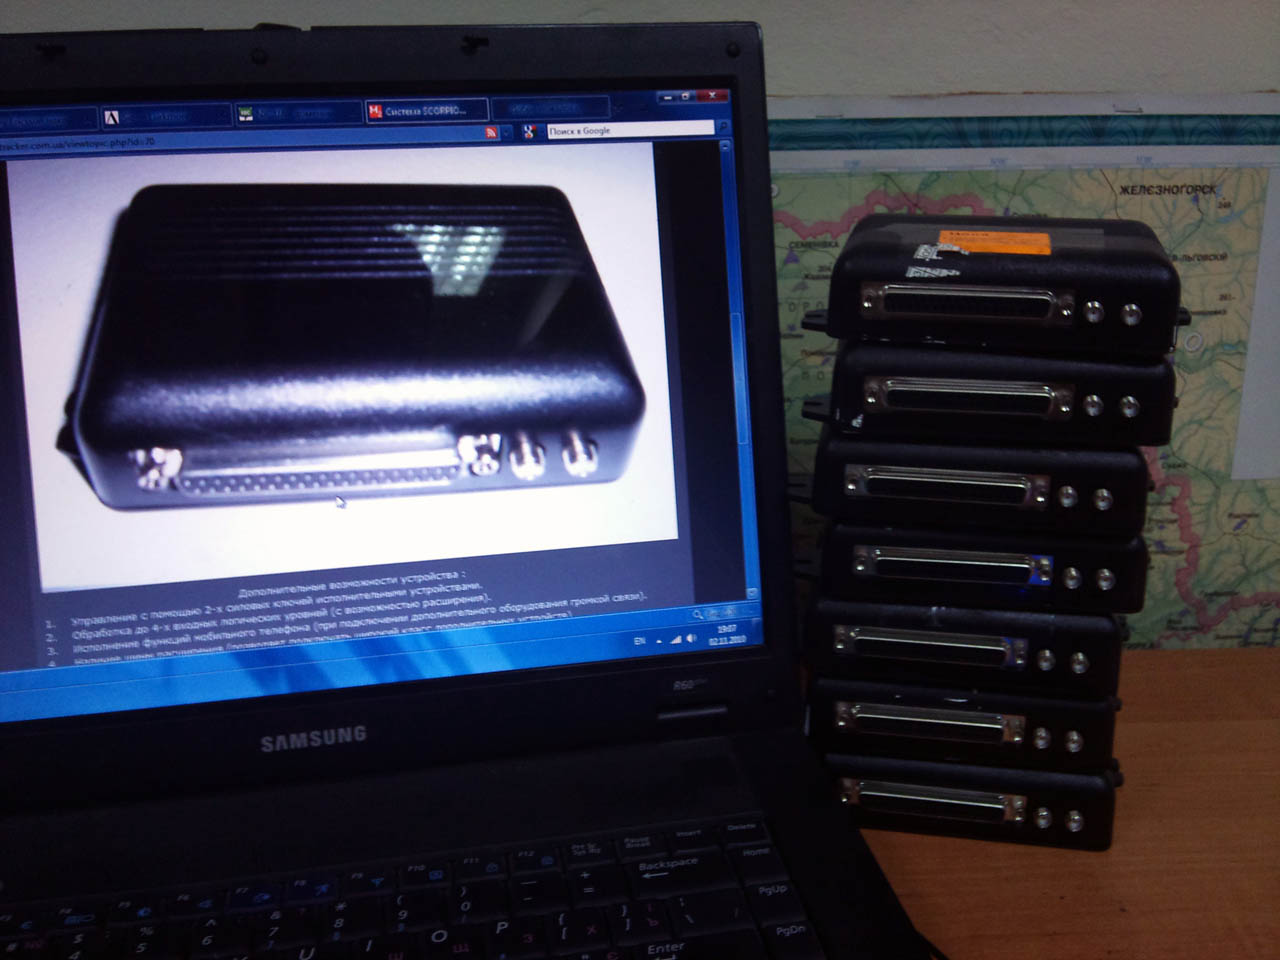 http://habrastorage.org/storage/7a20a841/0b54175e/c730274c/ef422d1c.jpg